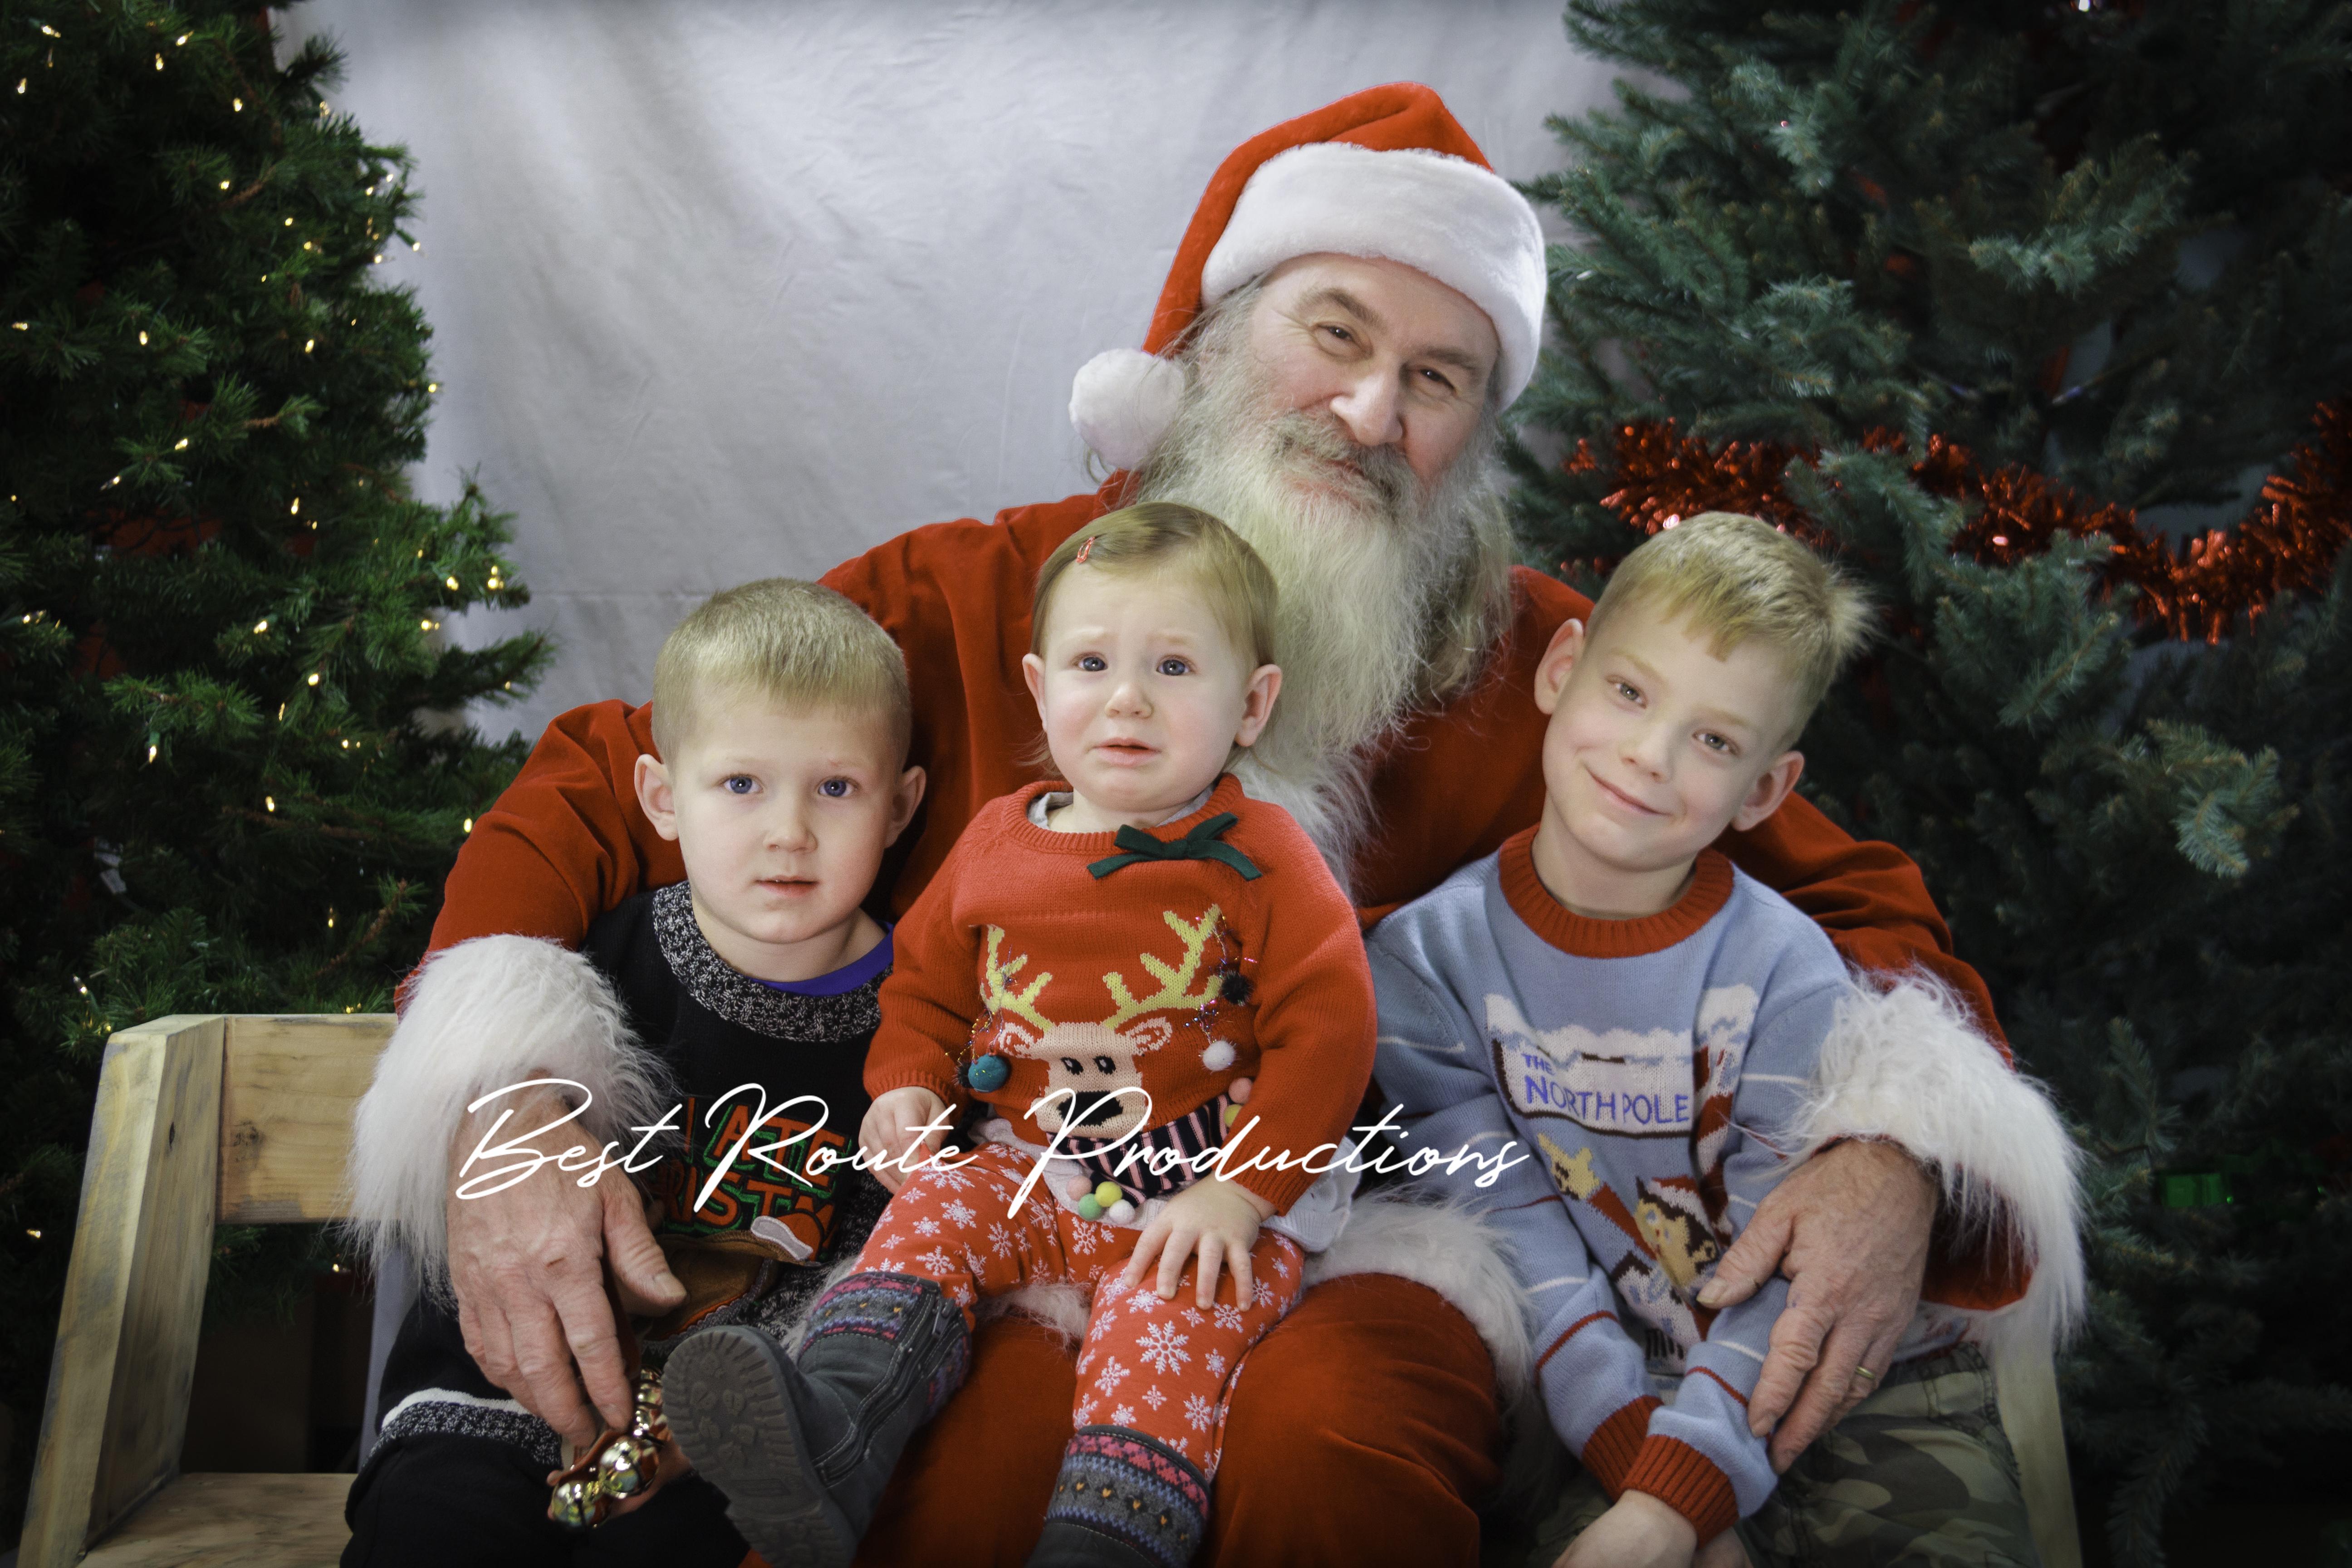 BestRoute_Santa_Web-6